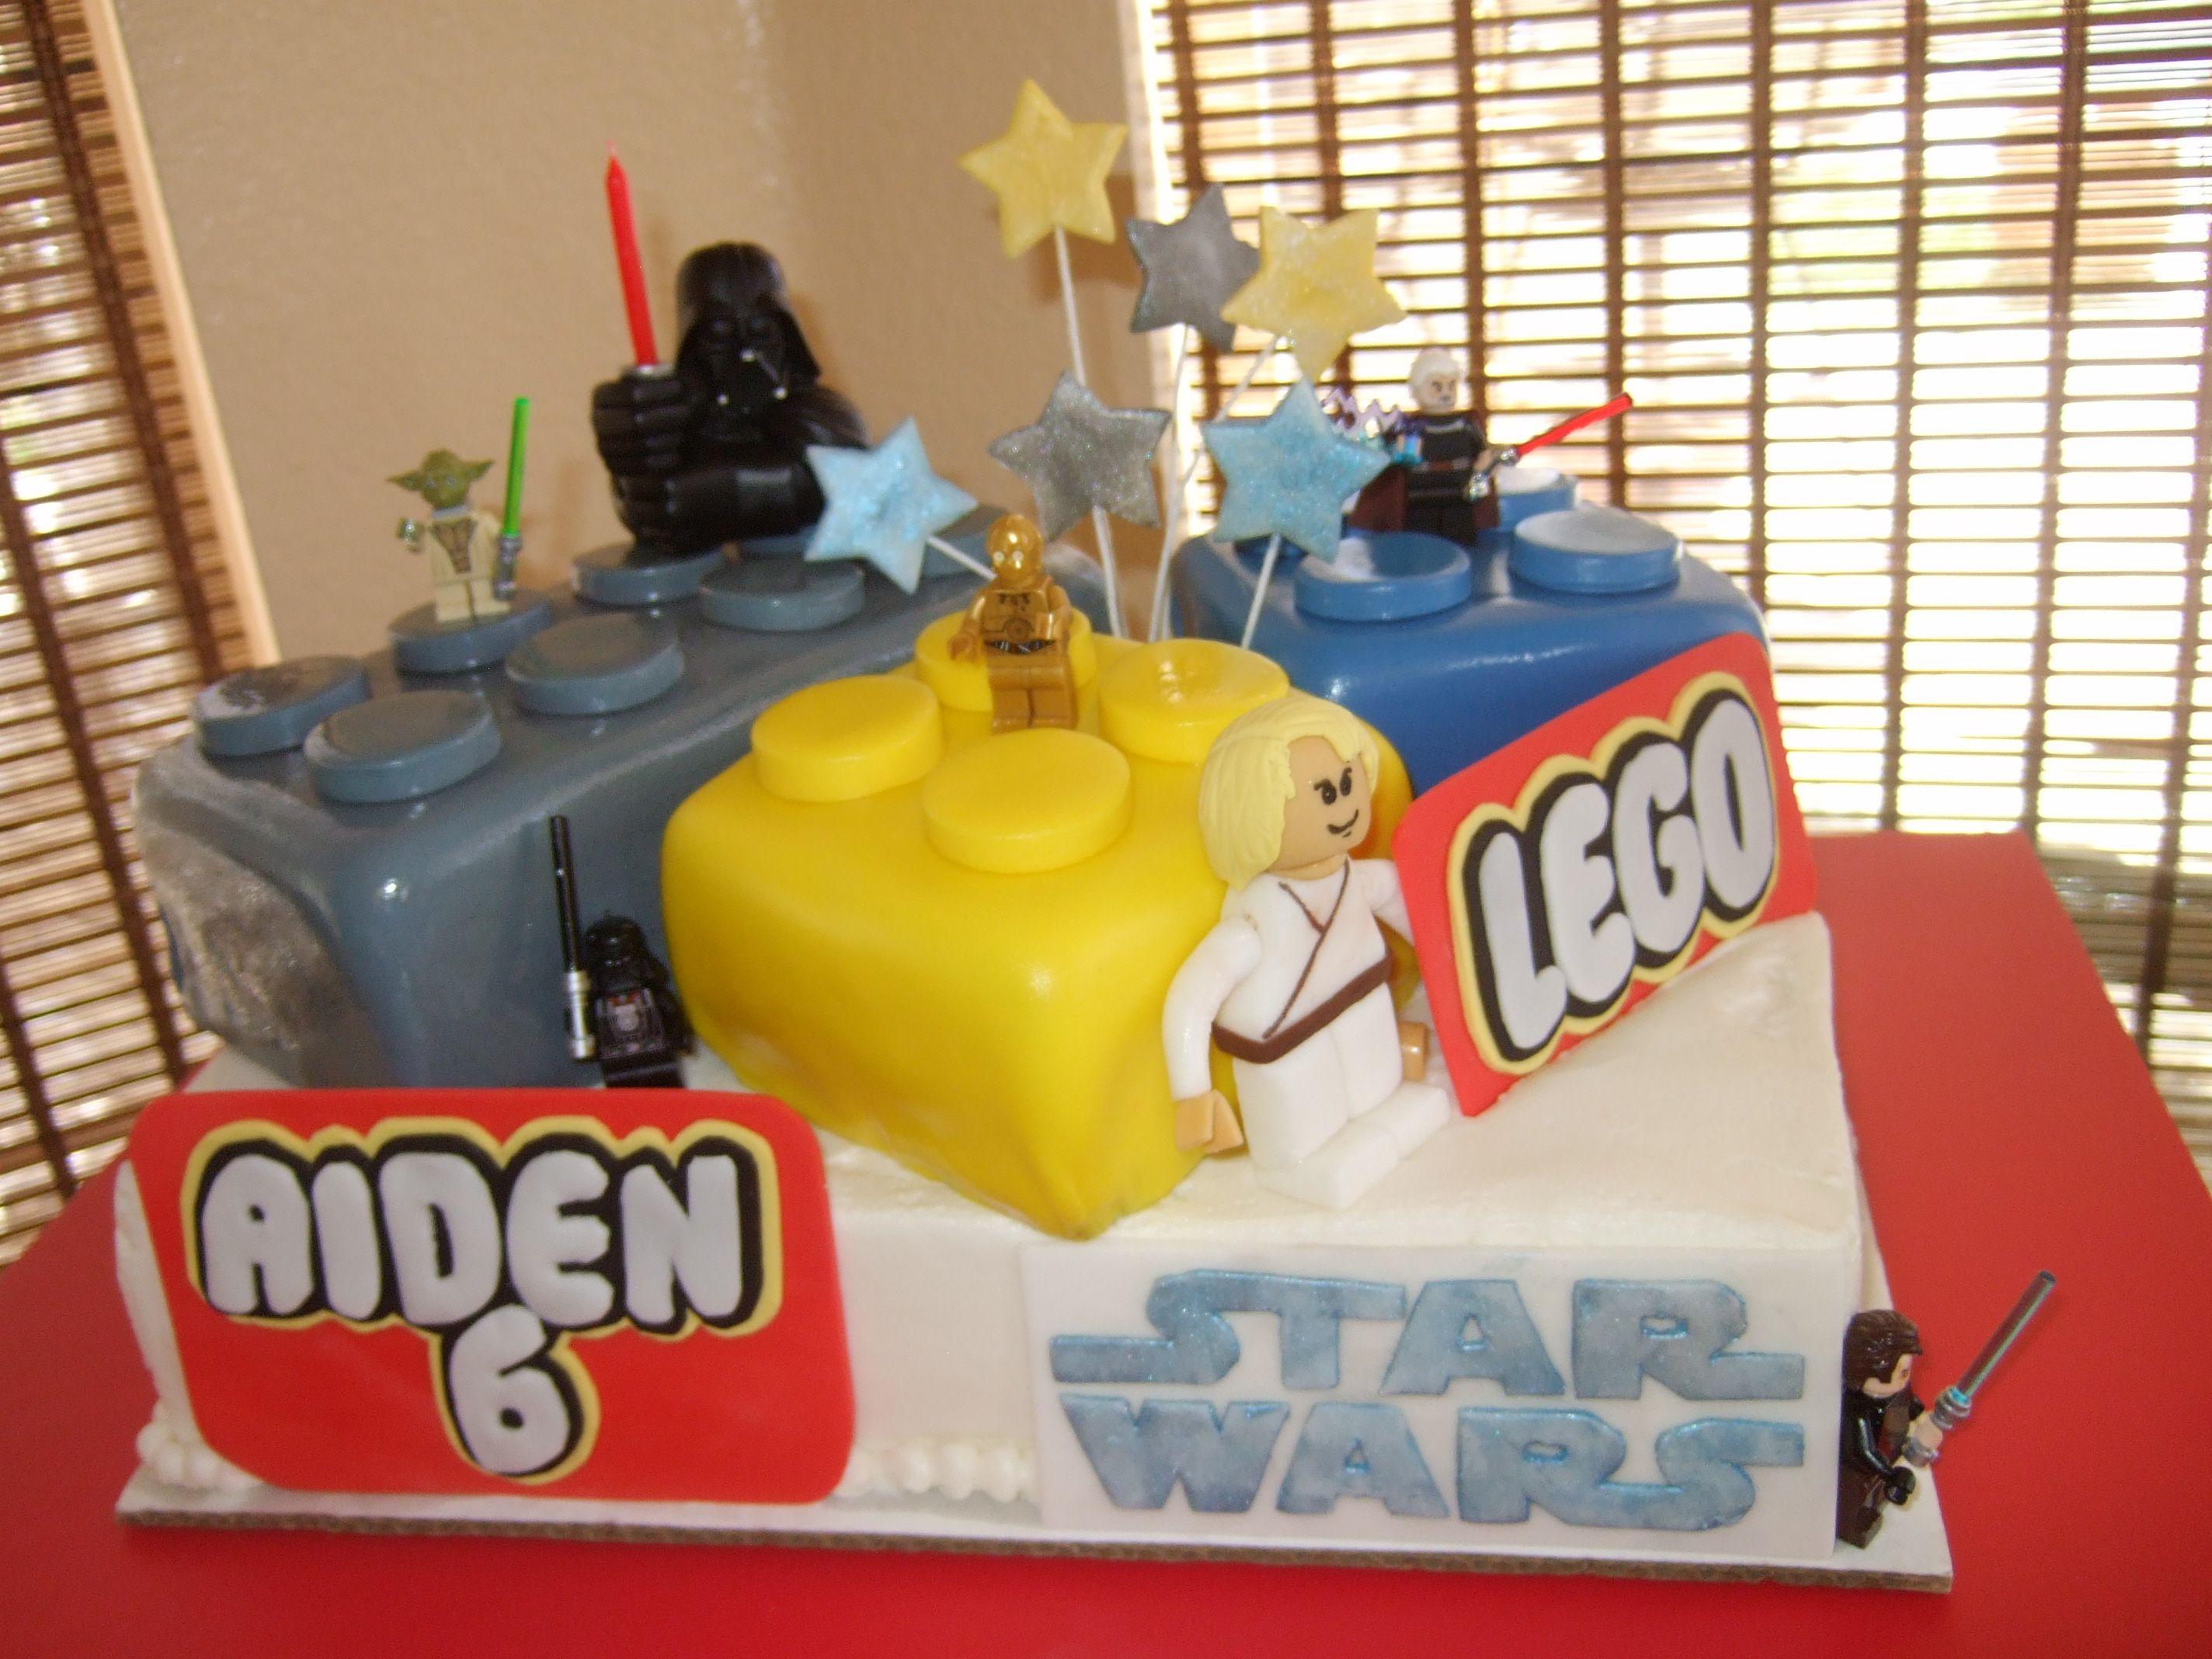 Star Wars Lego Decorations Star Wars Lego Birthday Cake Fondant Luke Skywalker Buttercream